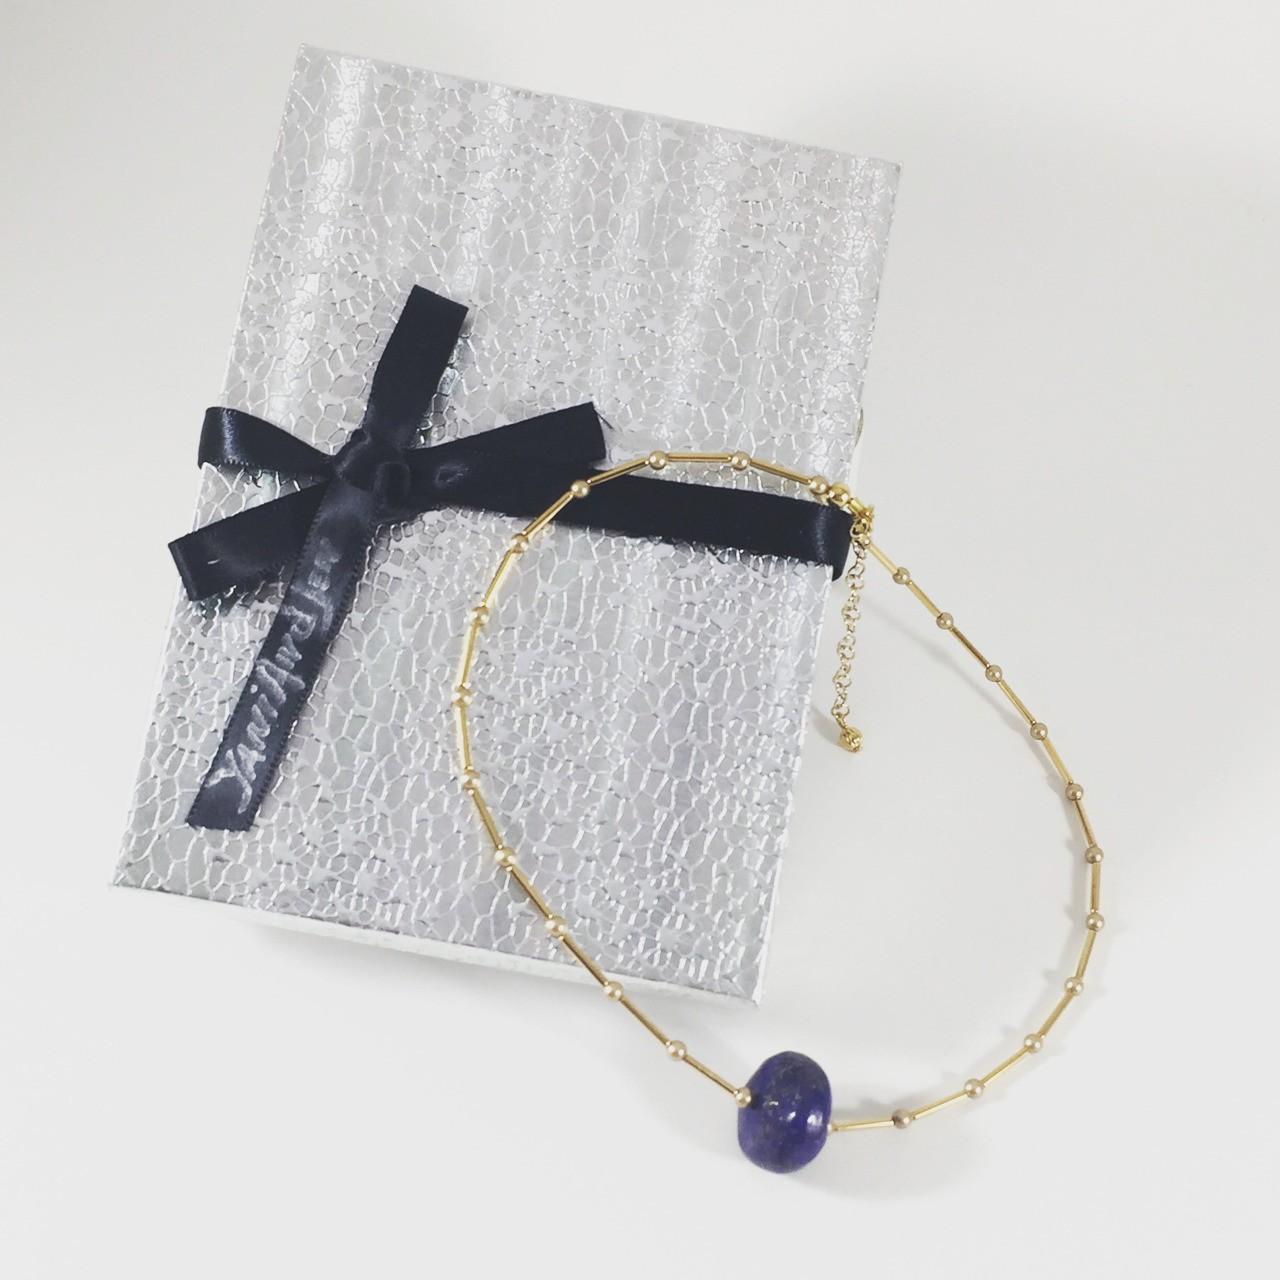 Handmade Jewelry by YaniAndJenJewelry